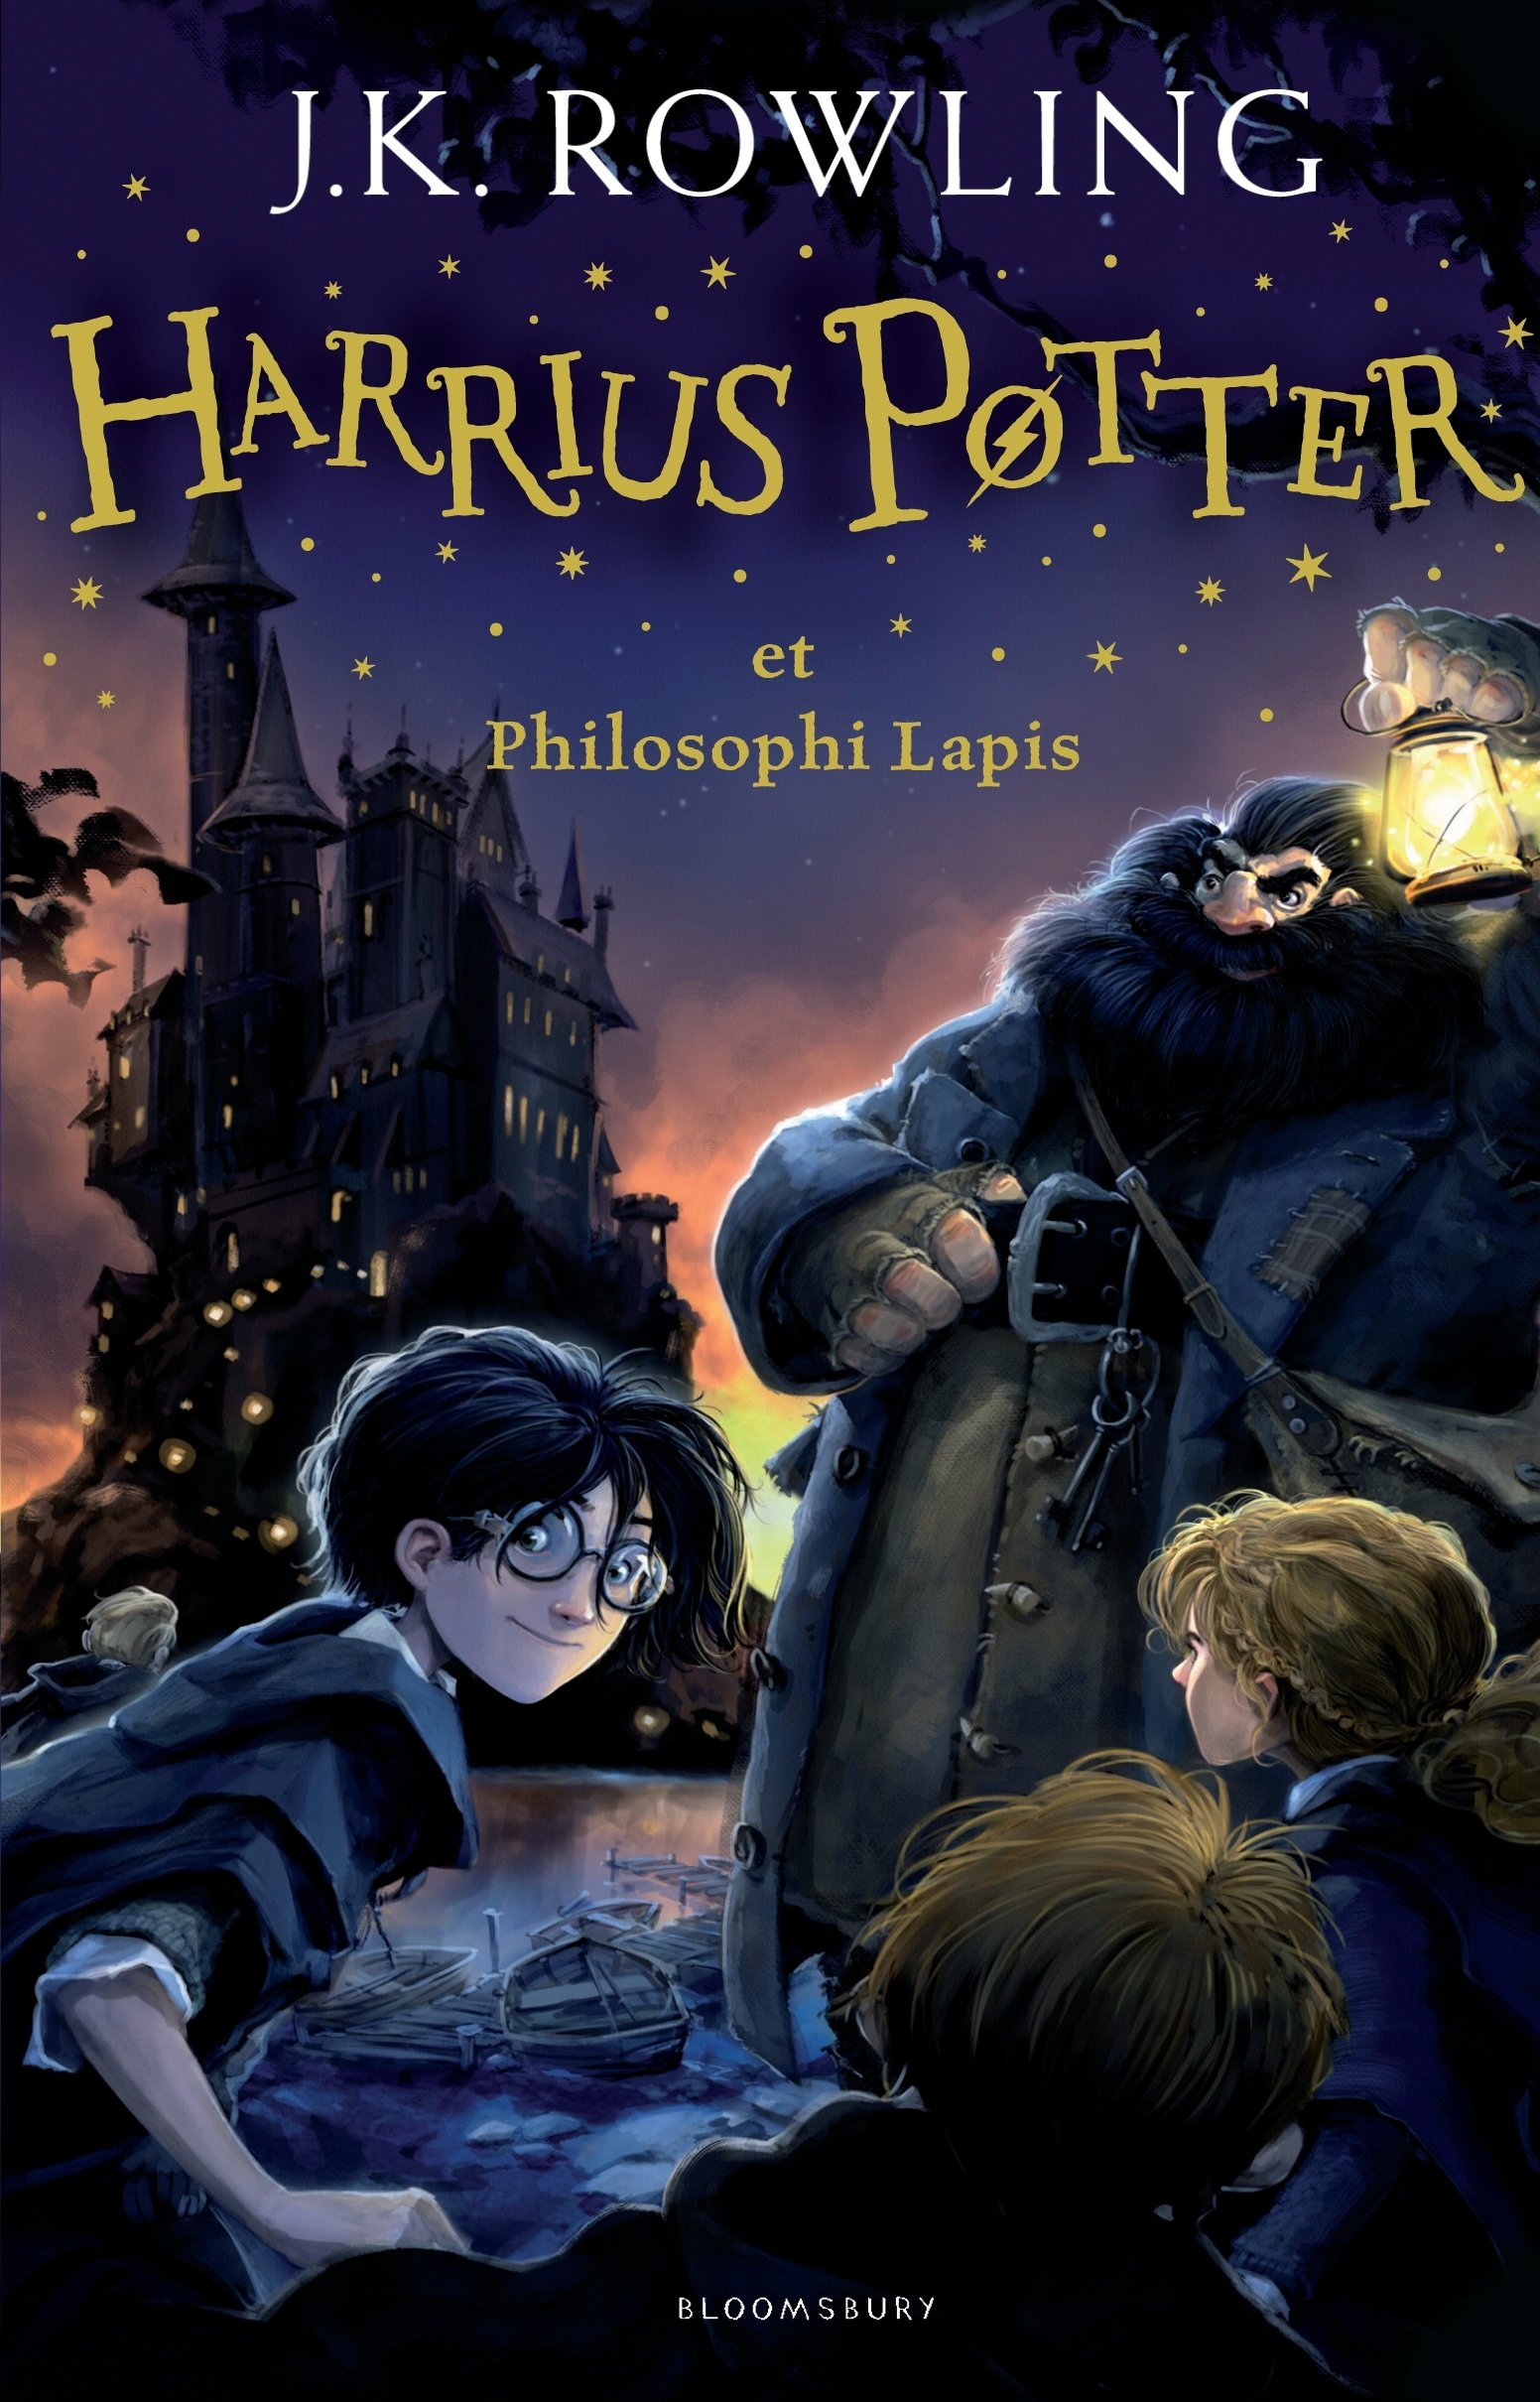 Harrius Potter et Philosophi Lapis (Harry Potter and the Philosopher's Stone, Latin edition) pdf epub